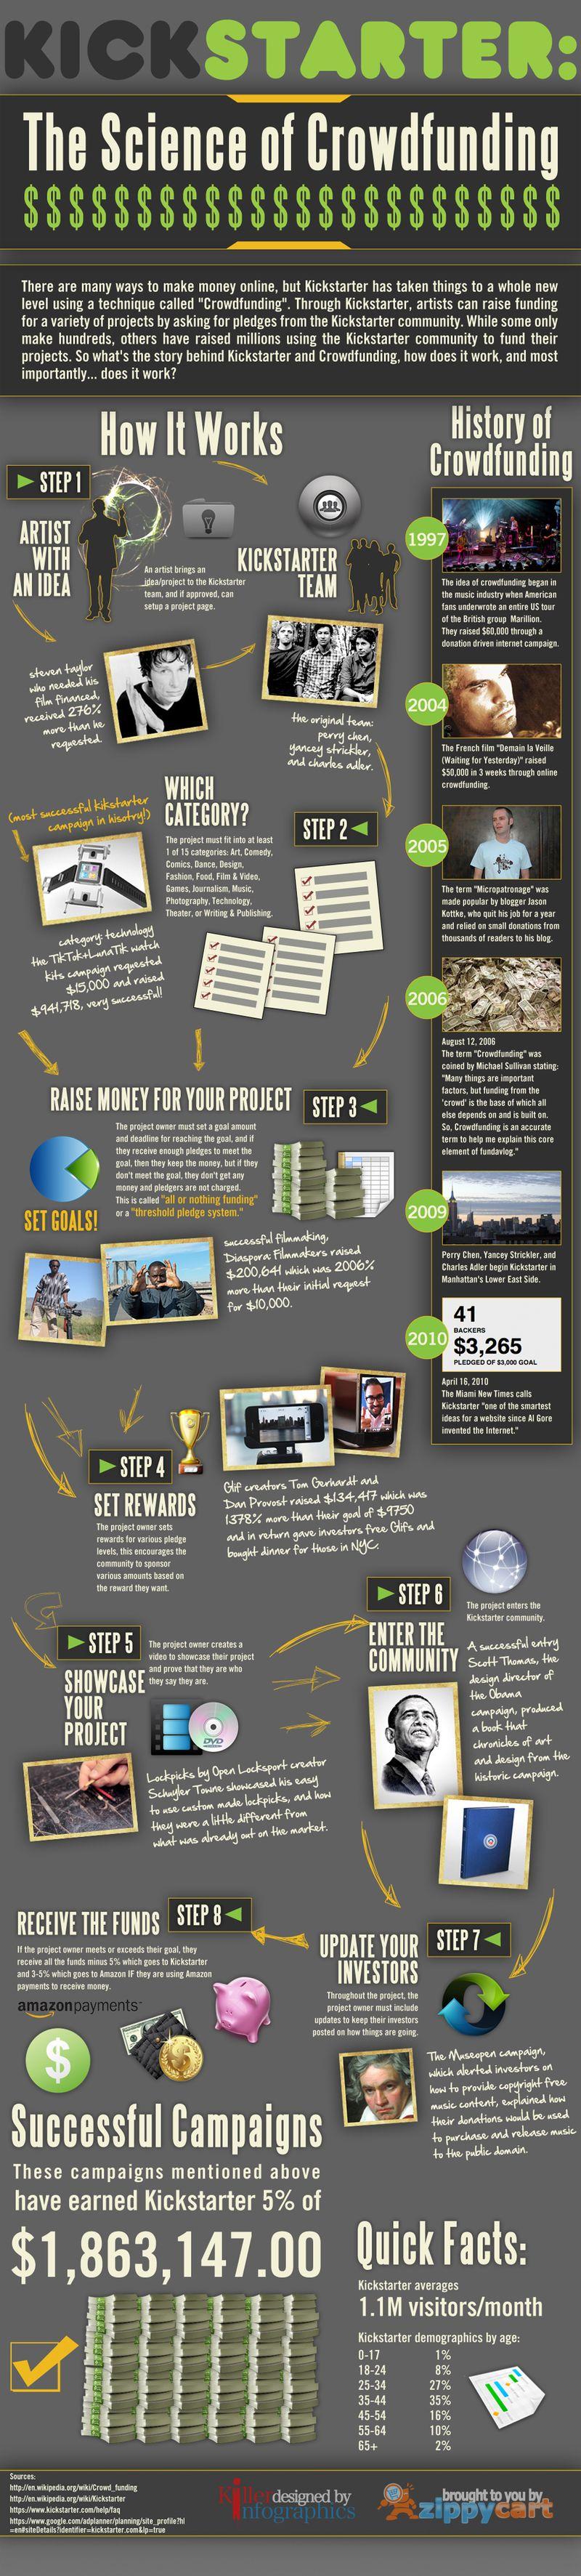 Infografic crowdfunding-with-kickstarter